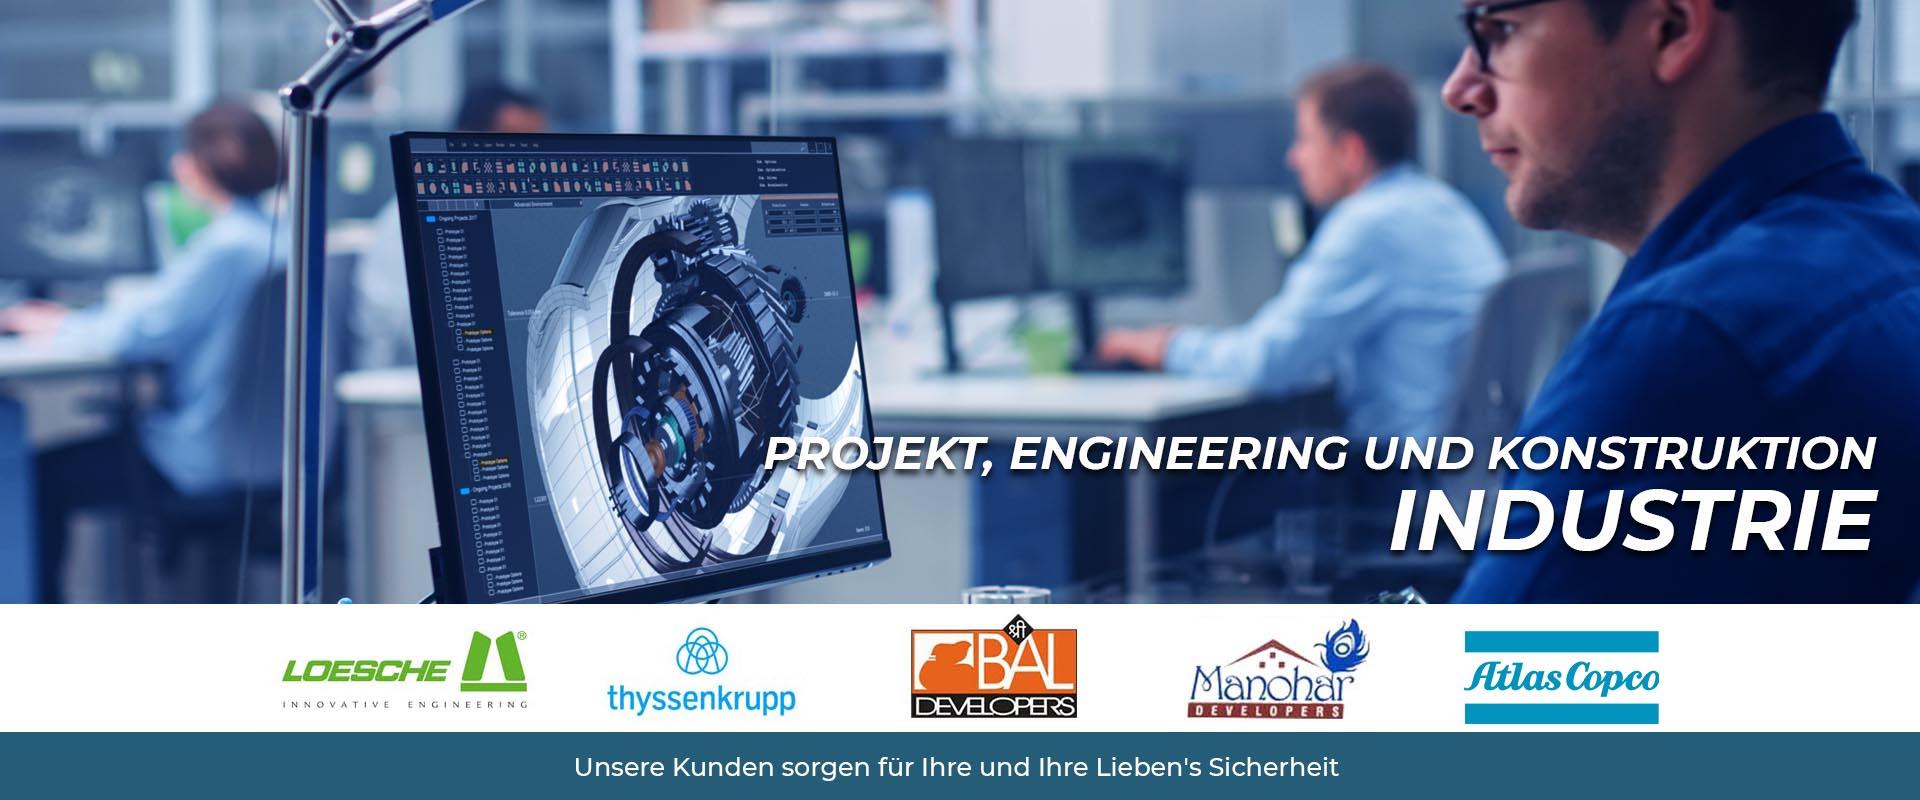 Projektindustrie